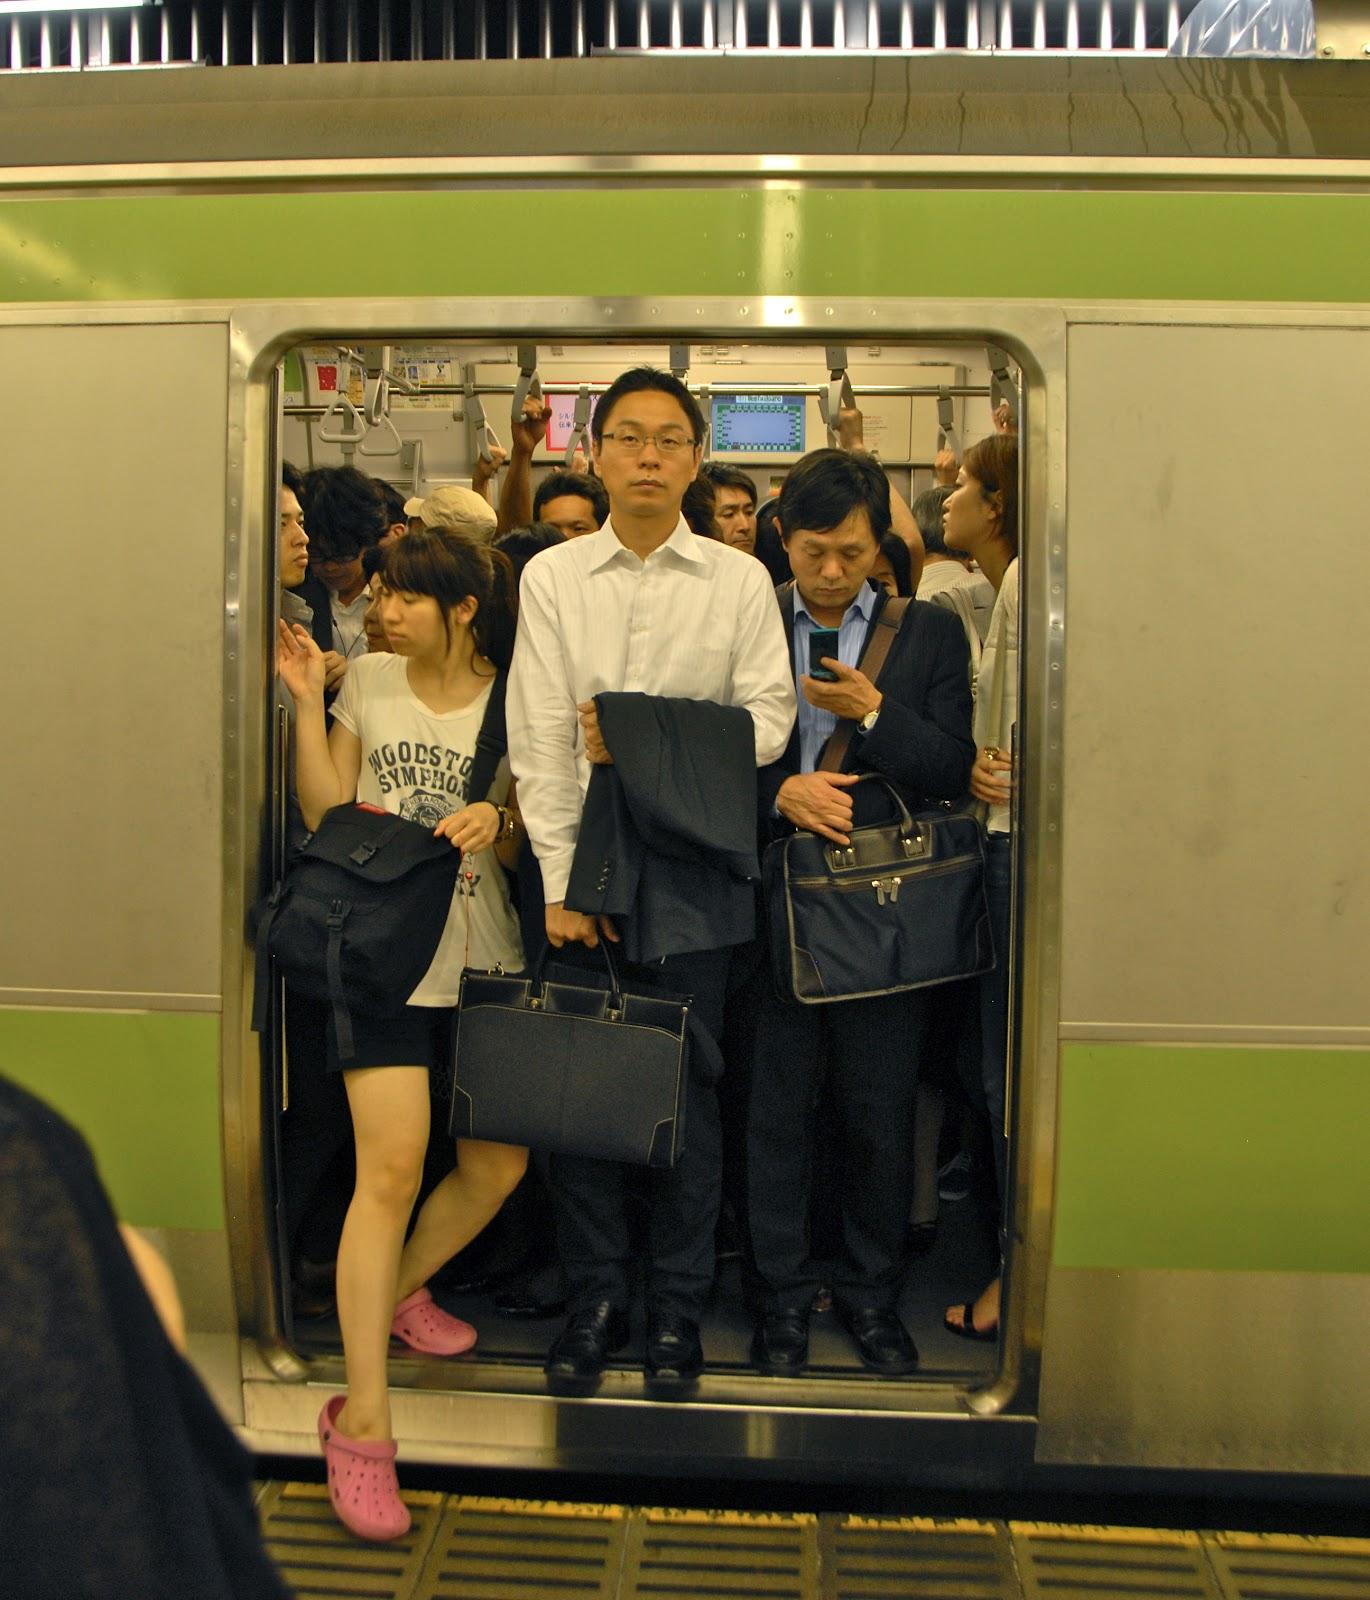 Grope train